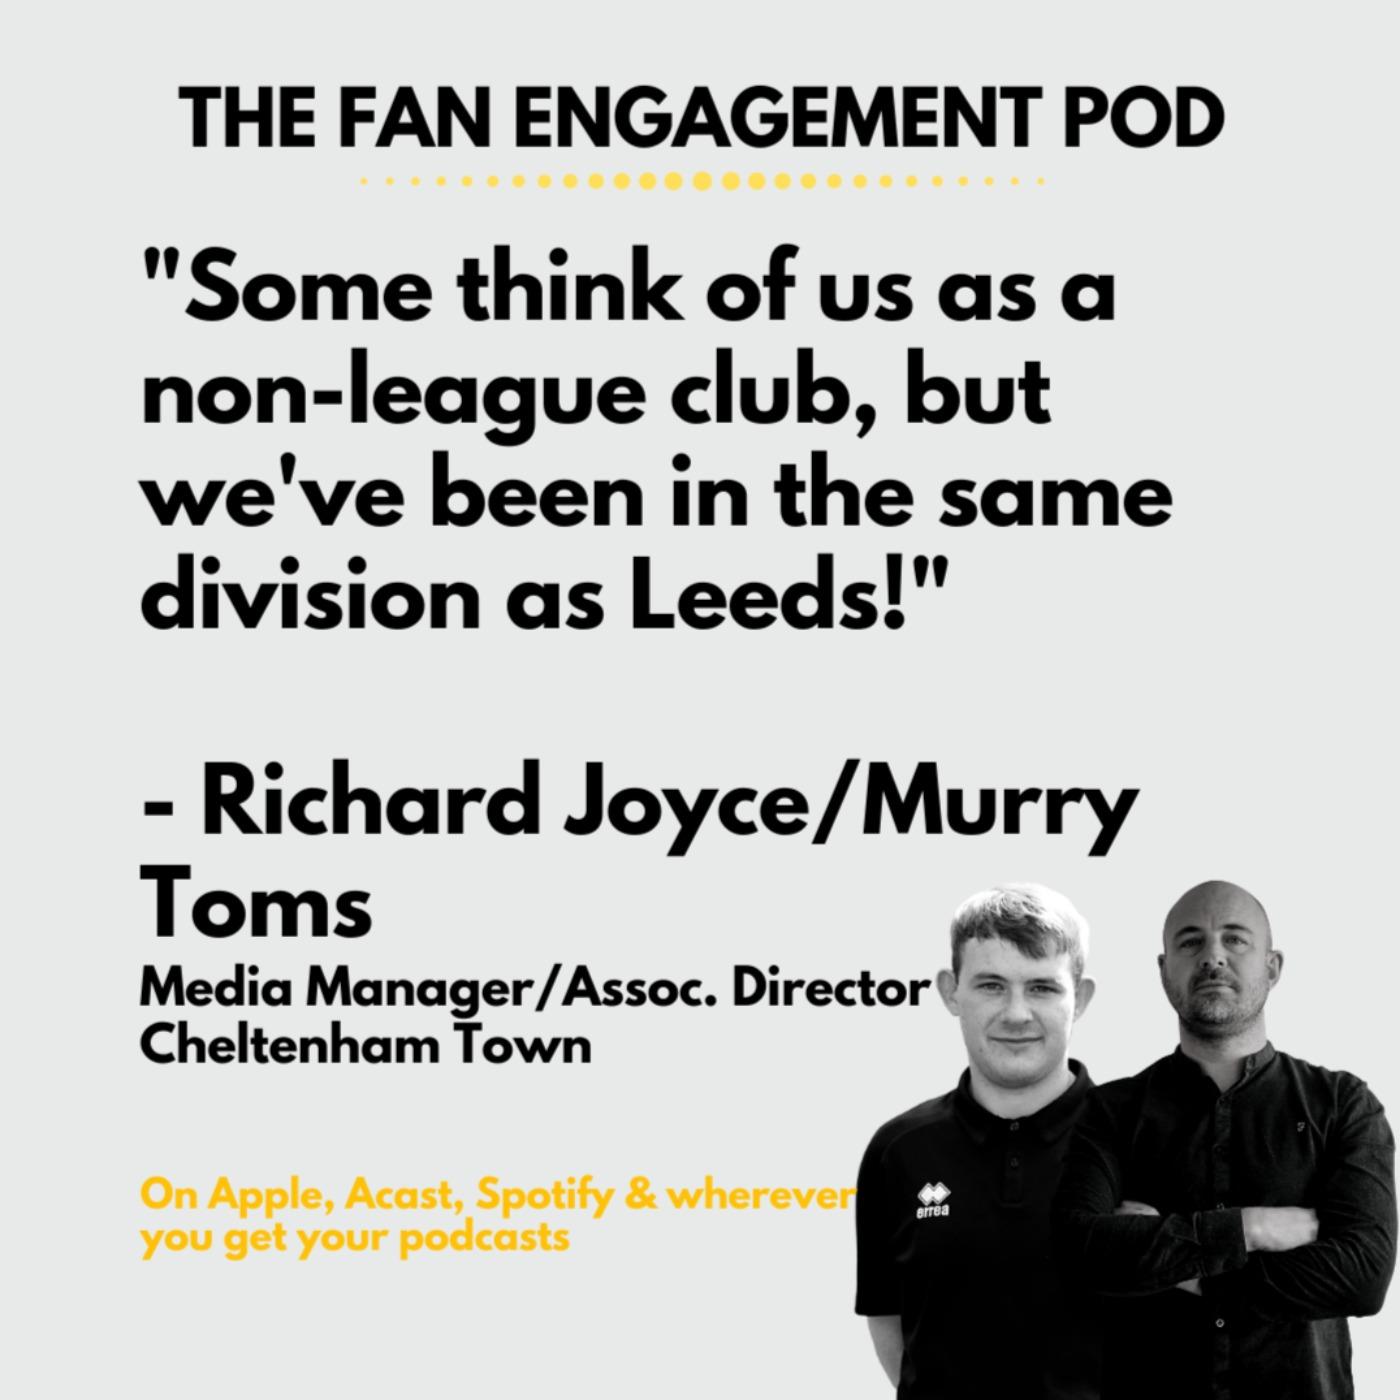 Cheltenham Town: Has Covid transformed engagement